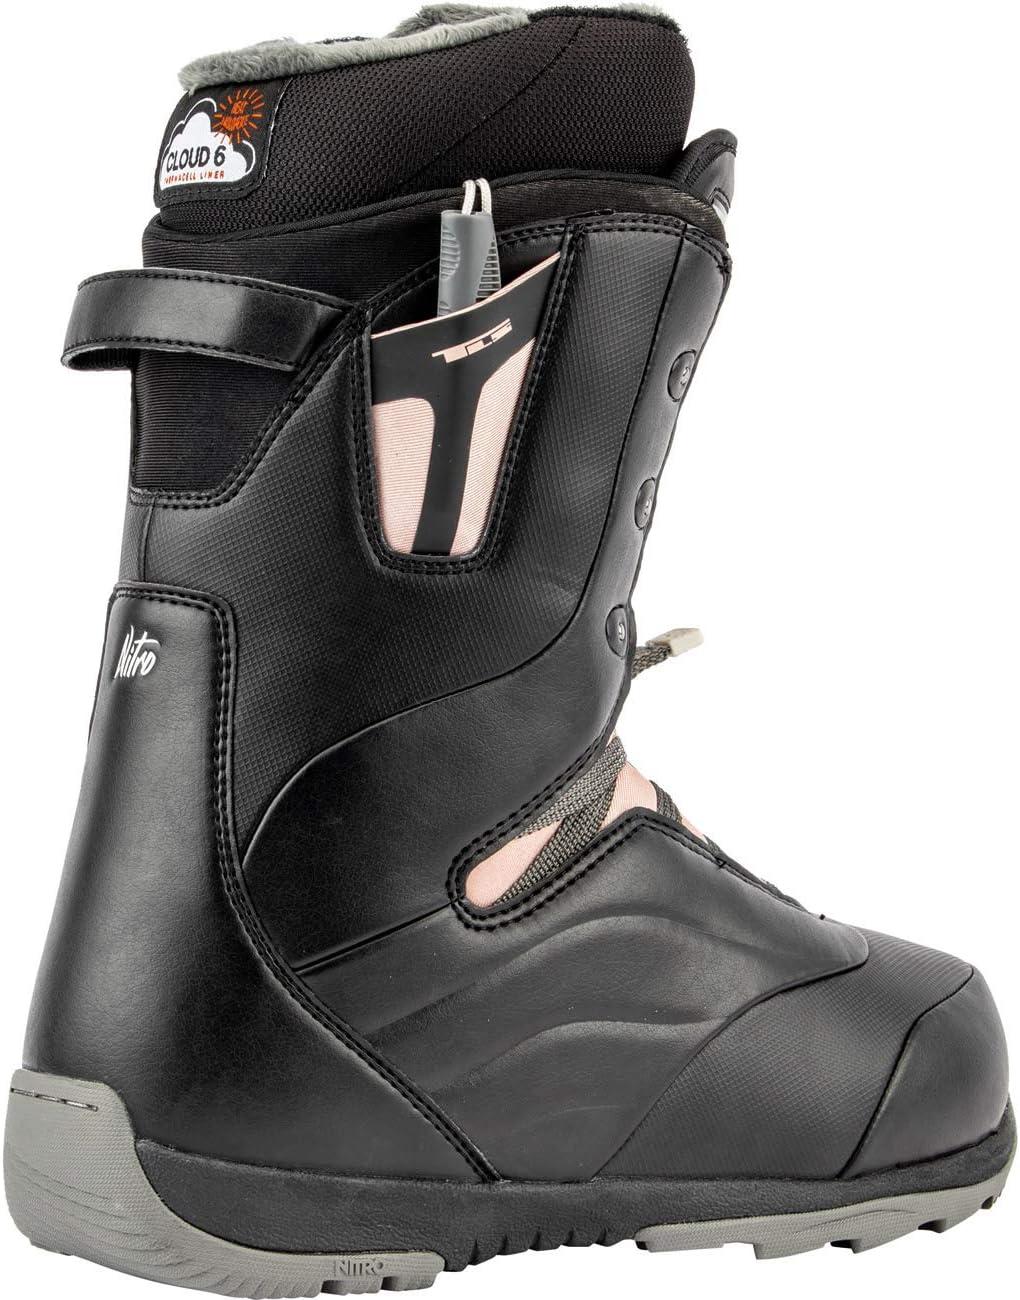 Nitro Crown TLS Snowboard Boot Womens